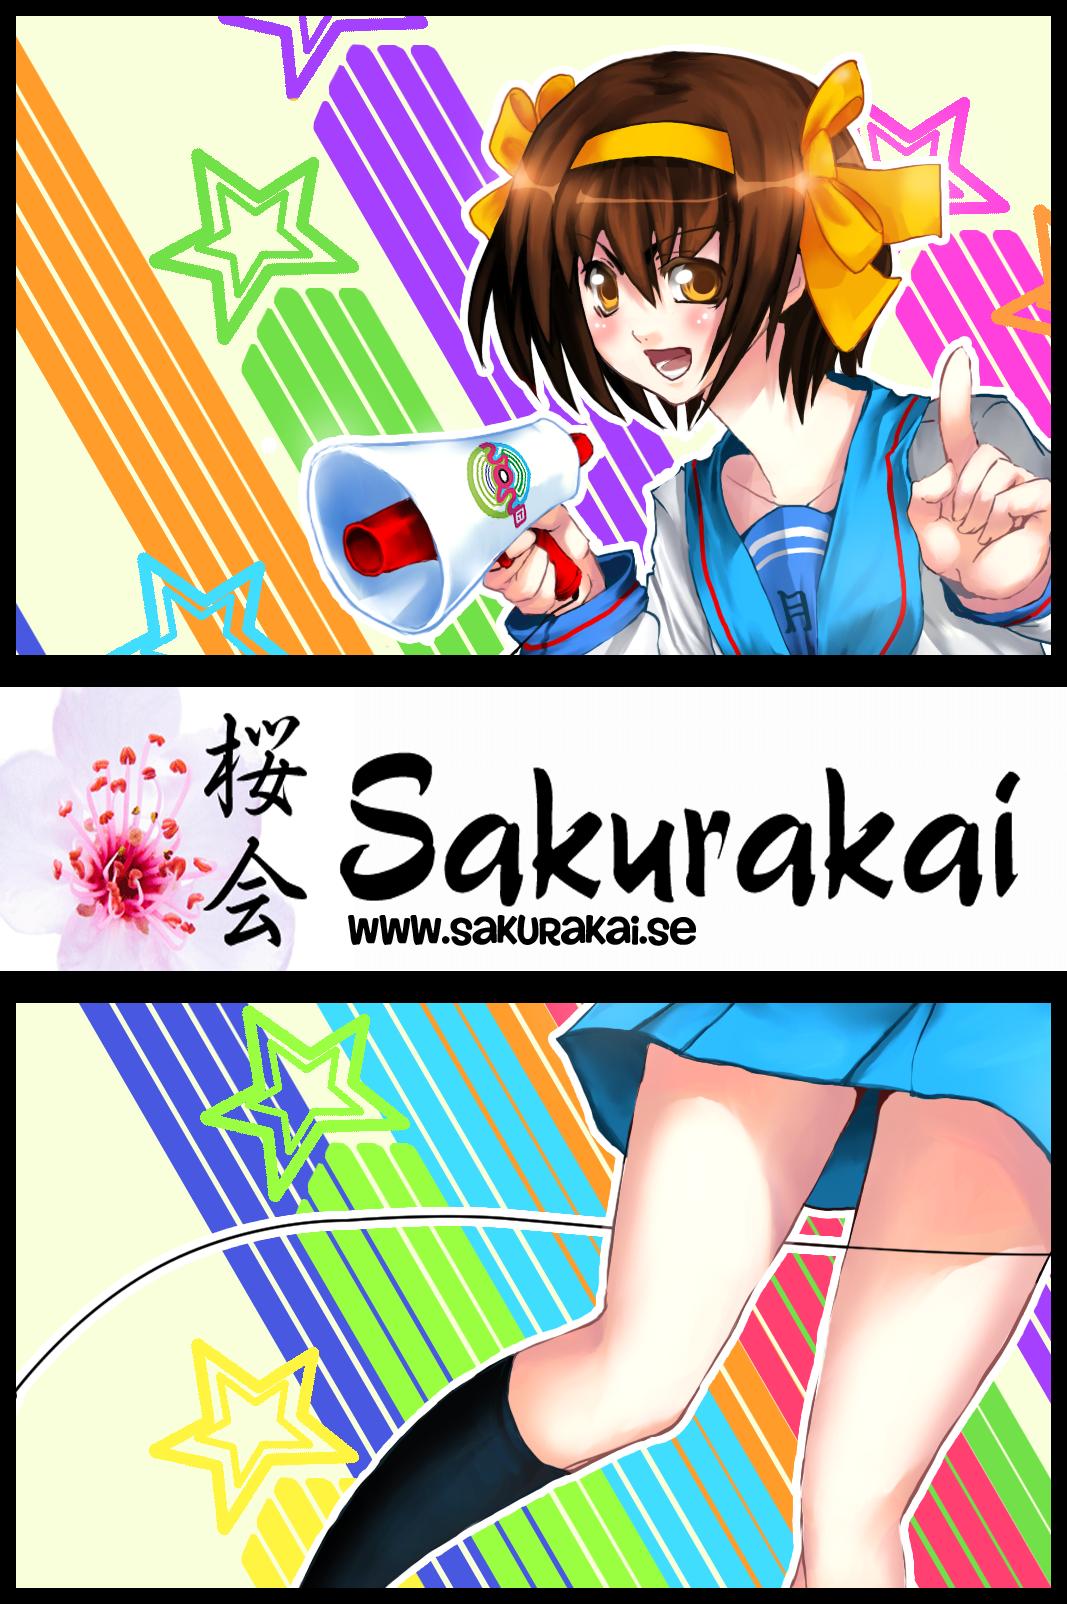 Sakurakai Poster